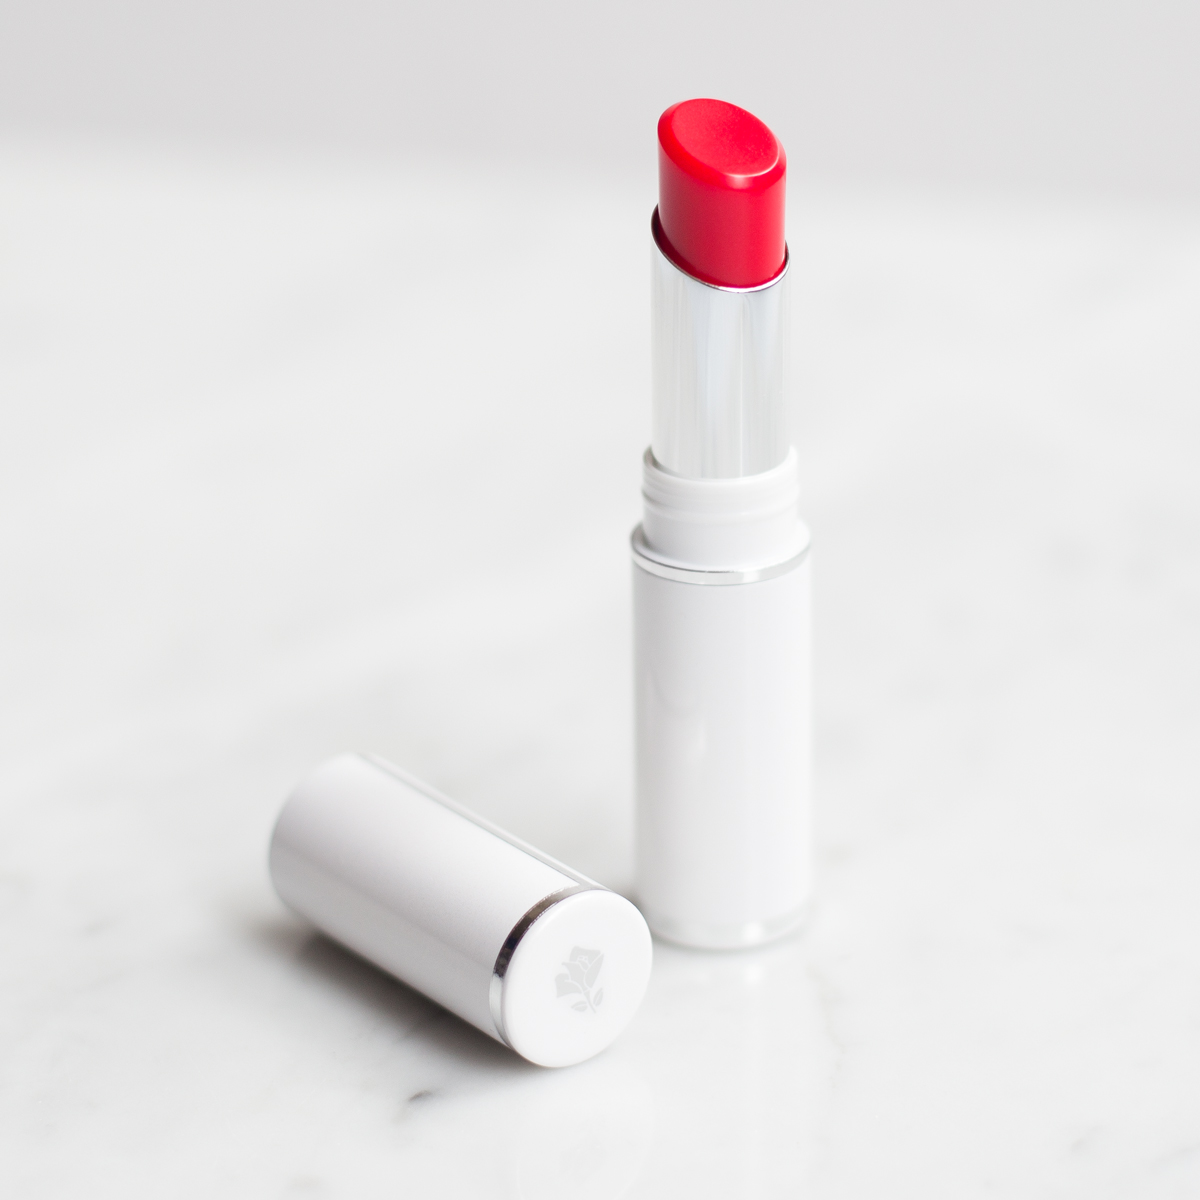 7 Days - 7 Red Lipsticks - die besten roten Lippenstifte II How I met my outfit by Dana Lohmüller